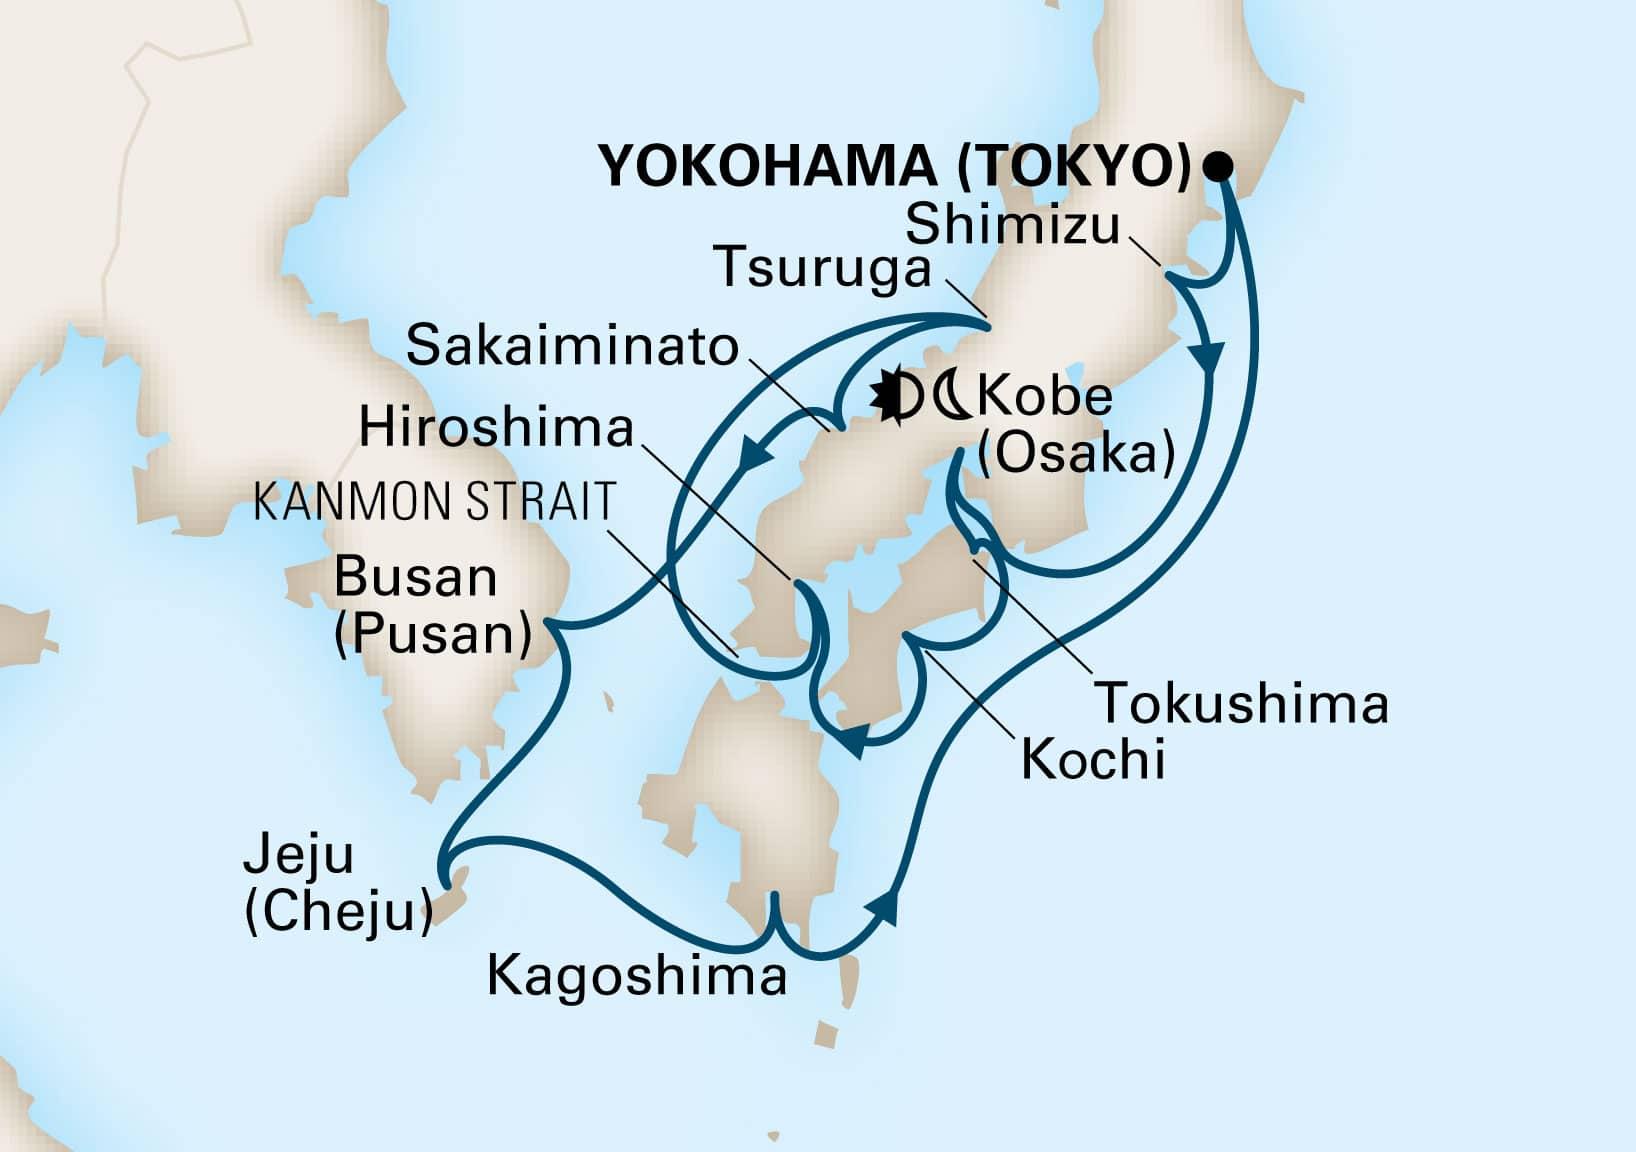 Map depicting the 14-day japan explorer itinerary leaving from yokohama (tokyo), japan and arriving in yokohama (tokyo), japan.